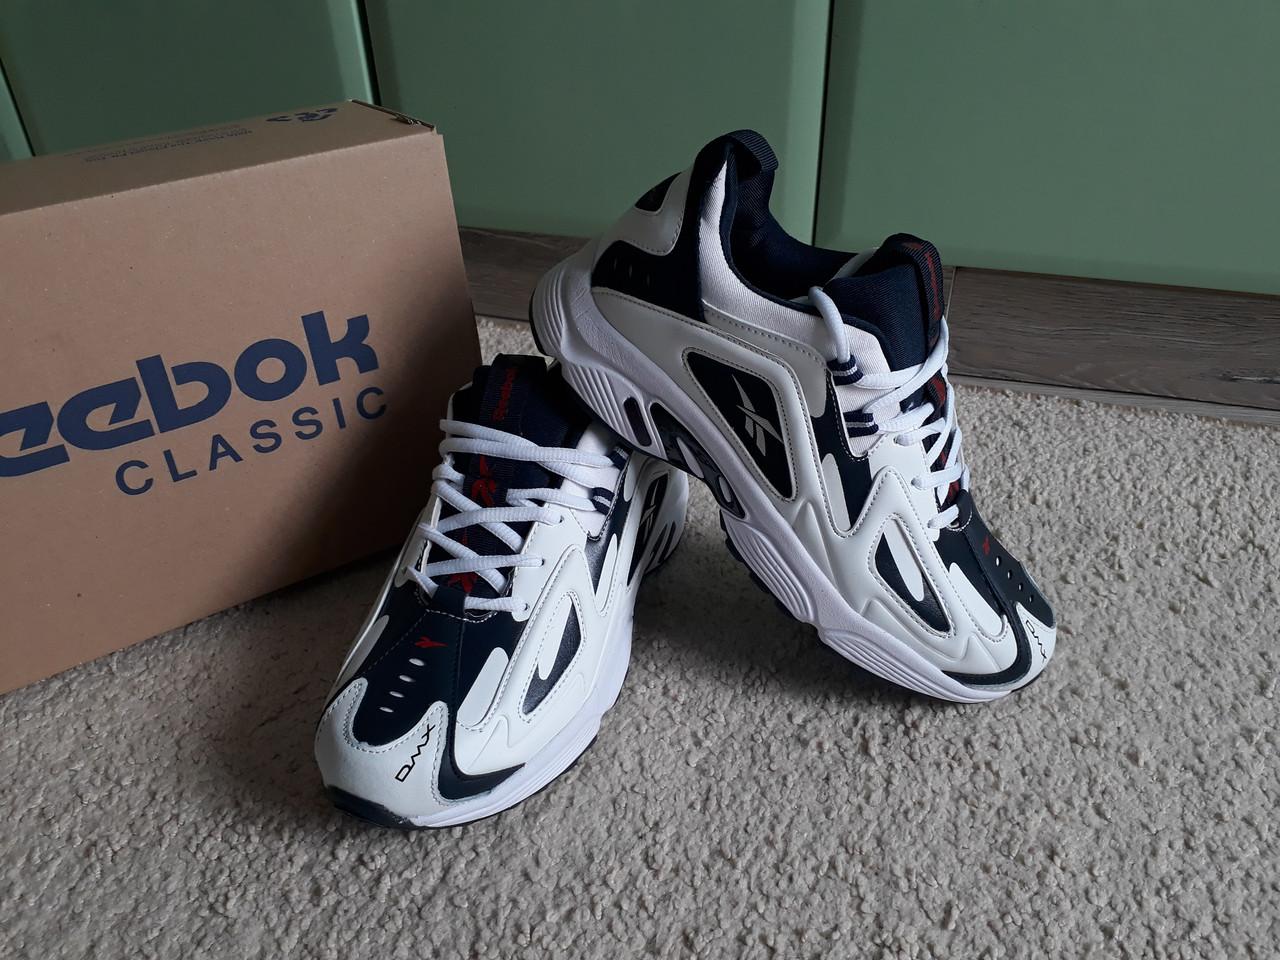 bb63ff23d1b22e Мужские кроссовки Reebok DMX 1200 White/Blue белые с синим - sinitsa_shop -  интернет-